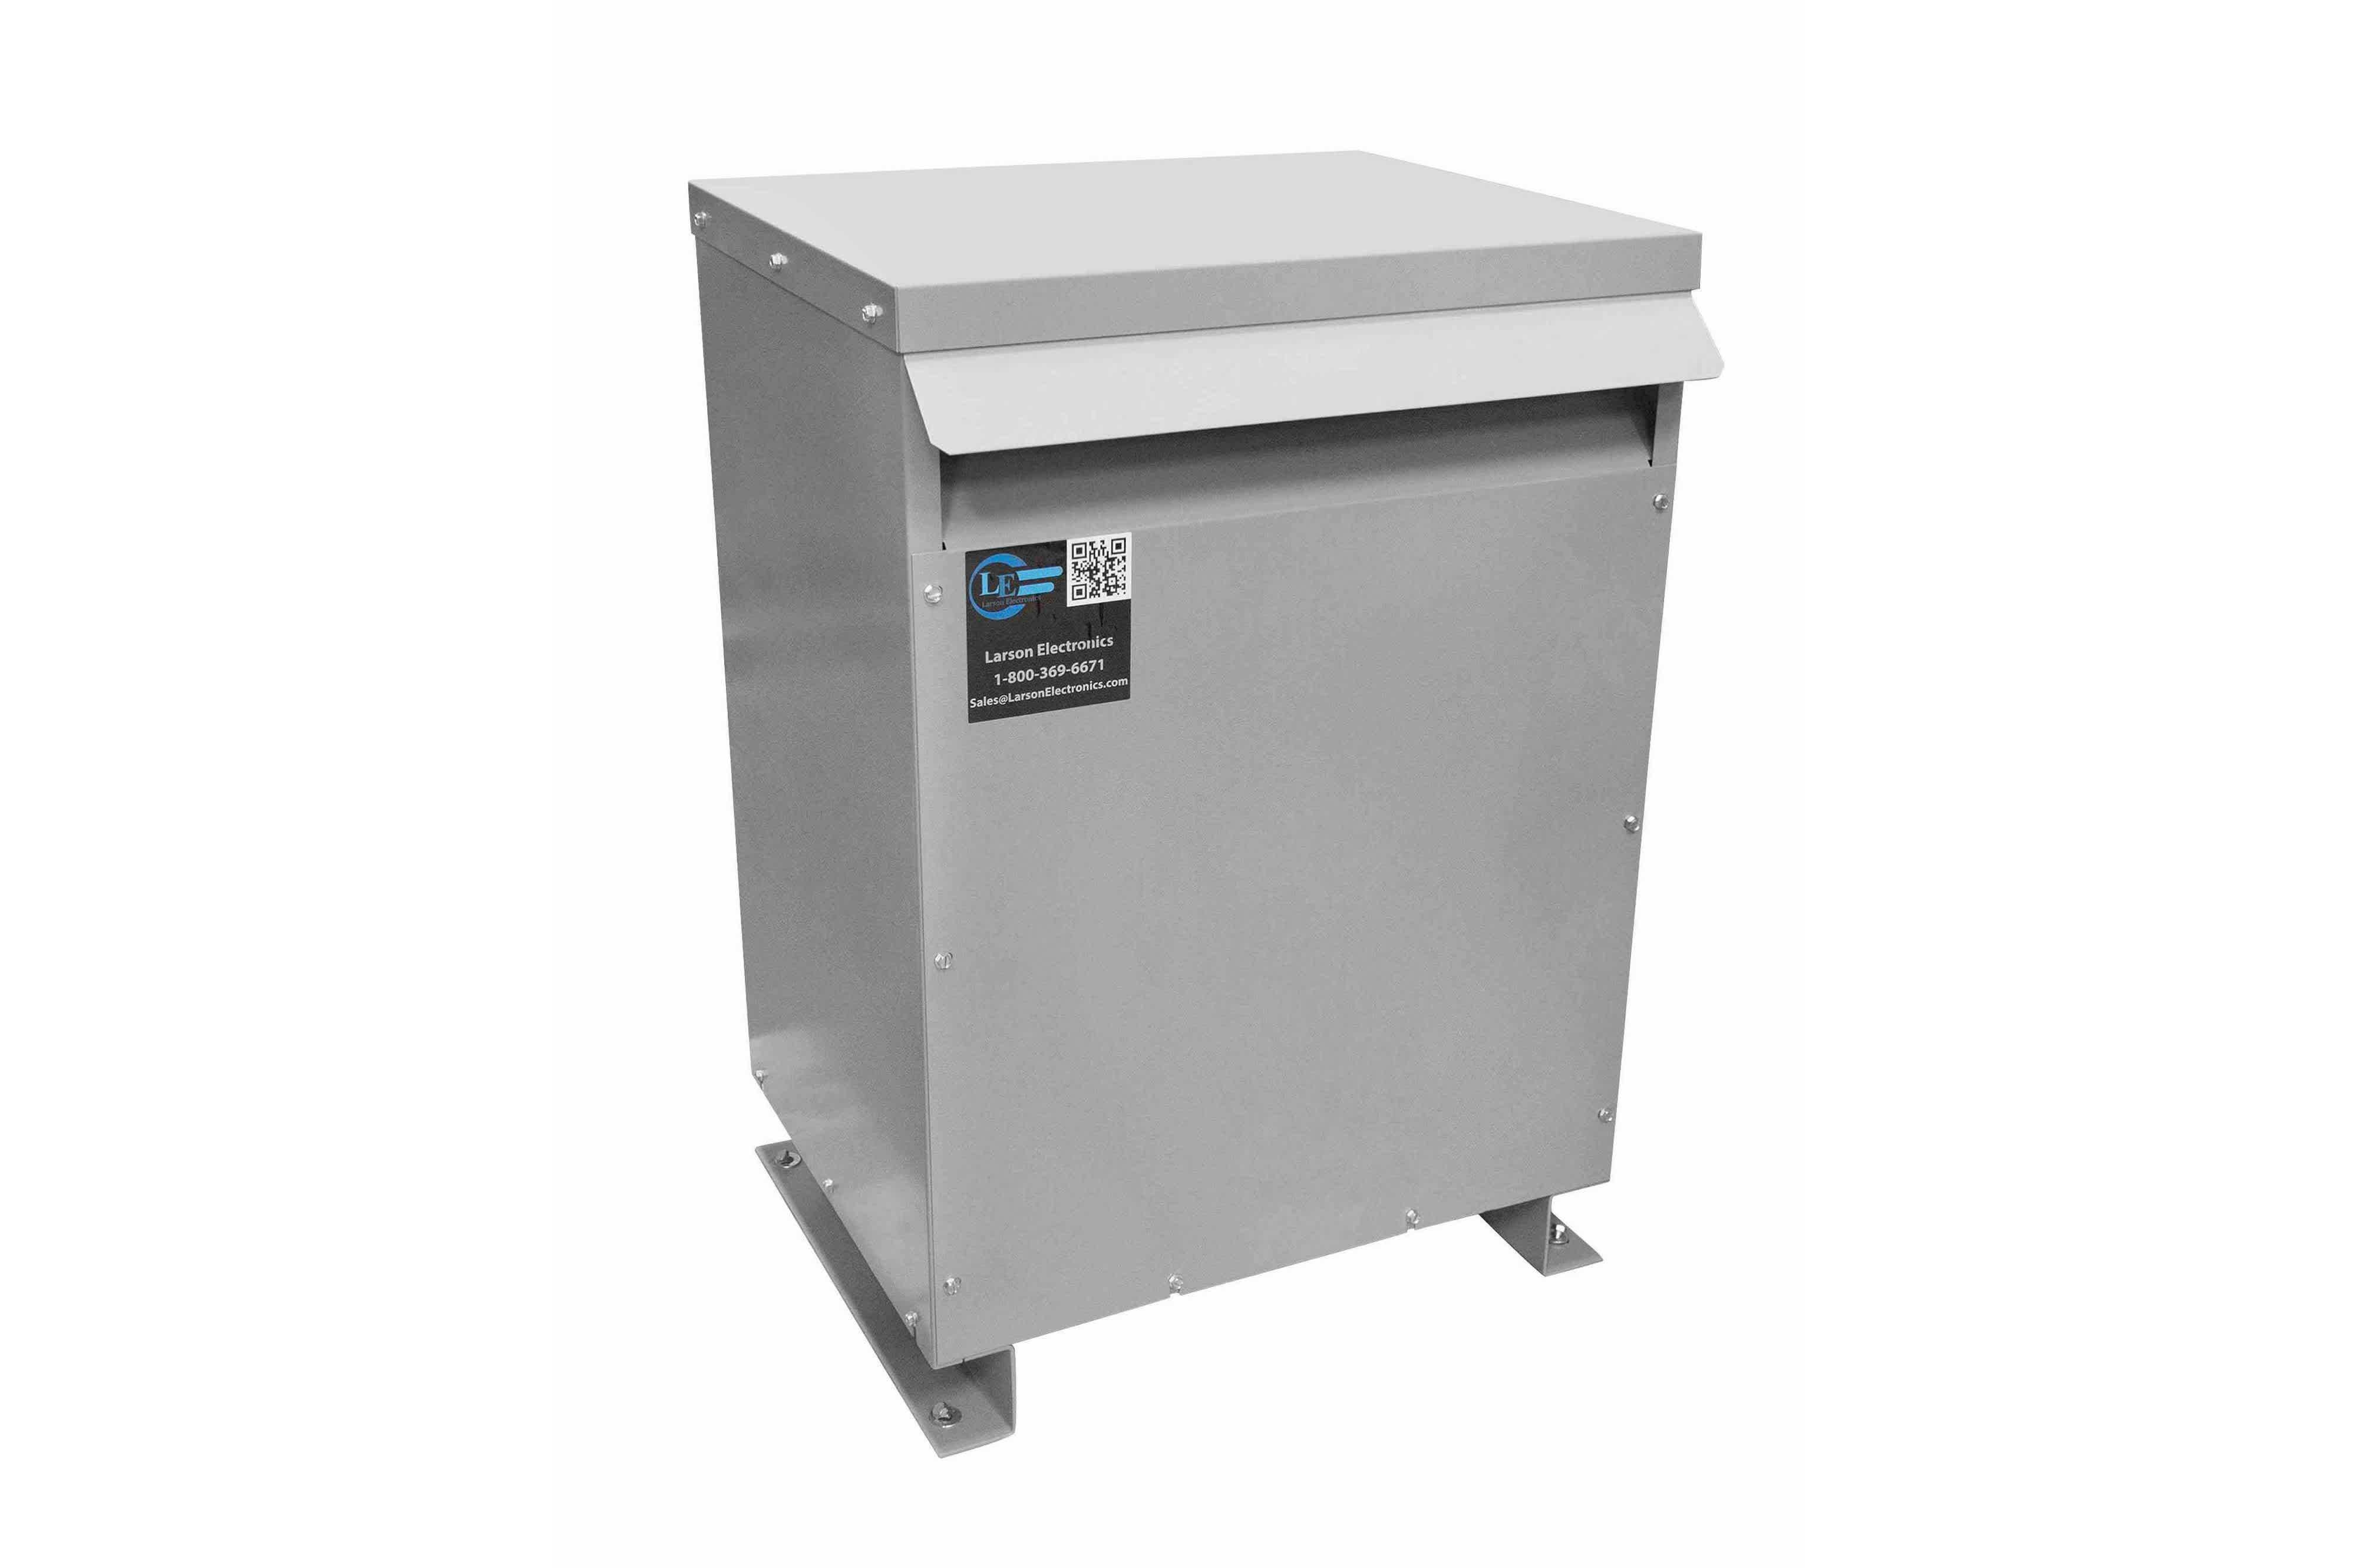 28 kVA 3PH Isolation Transformer, 600V Wye Primary, 480Y/277 Wye-N Secondary, N3R, Ventilated, 60 Hz